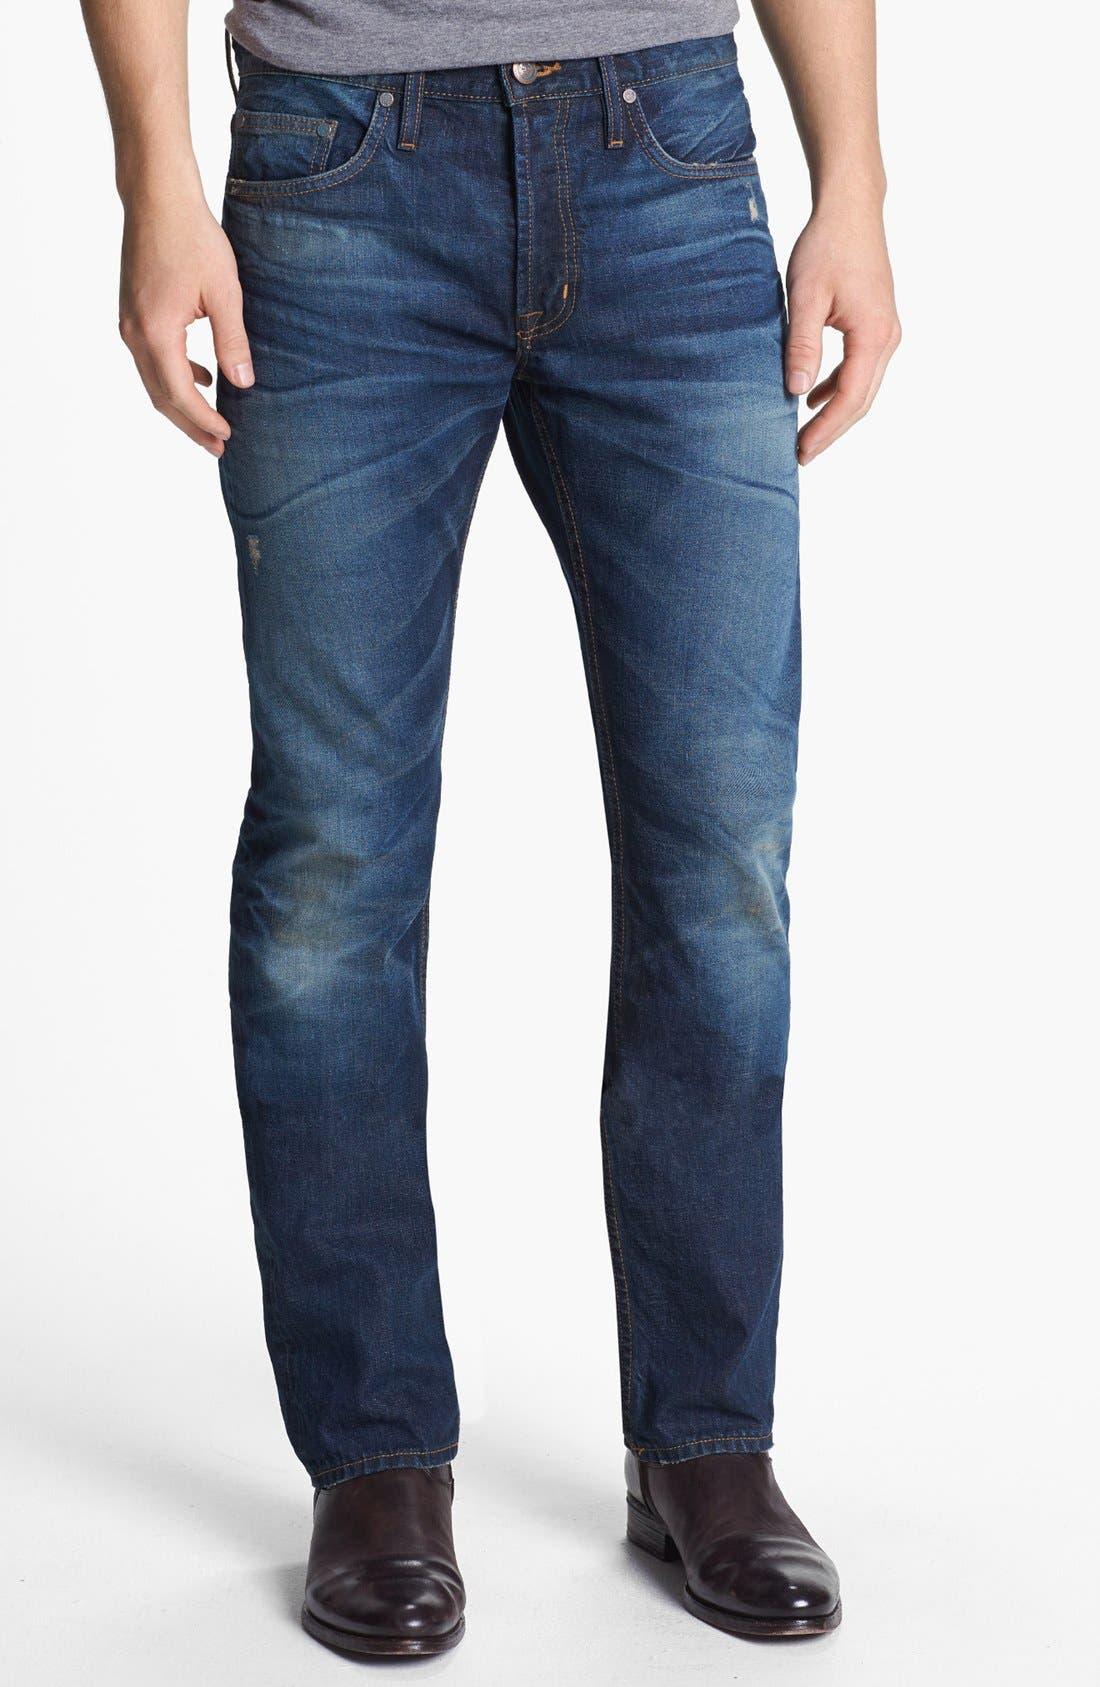 Main Image - Asbury Park '1874 Monte Carlo' Straight Leg Selvedge Jeans (Ocean Grove)